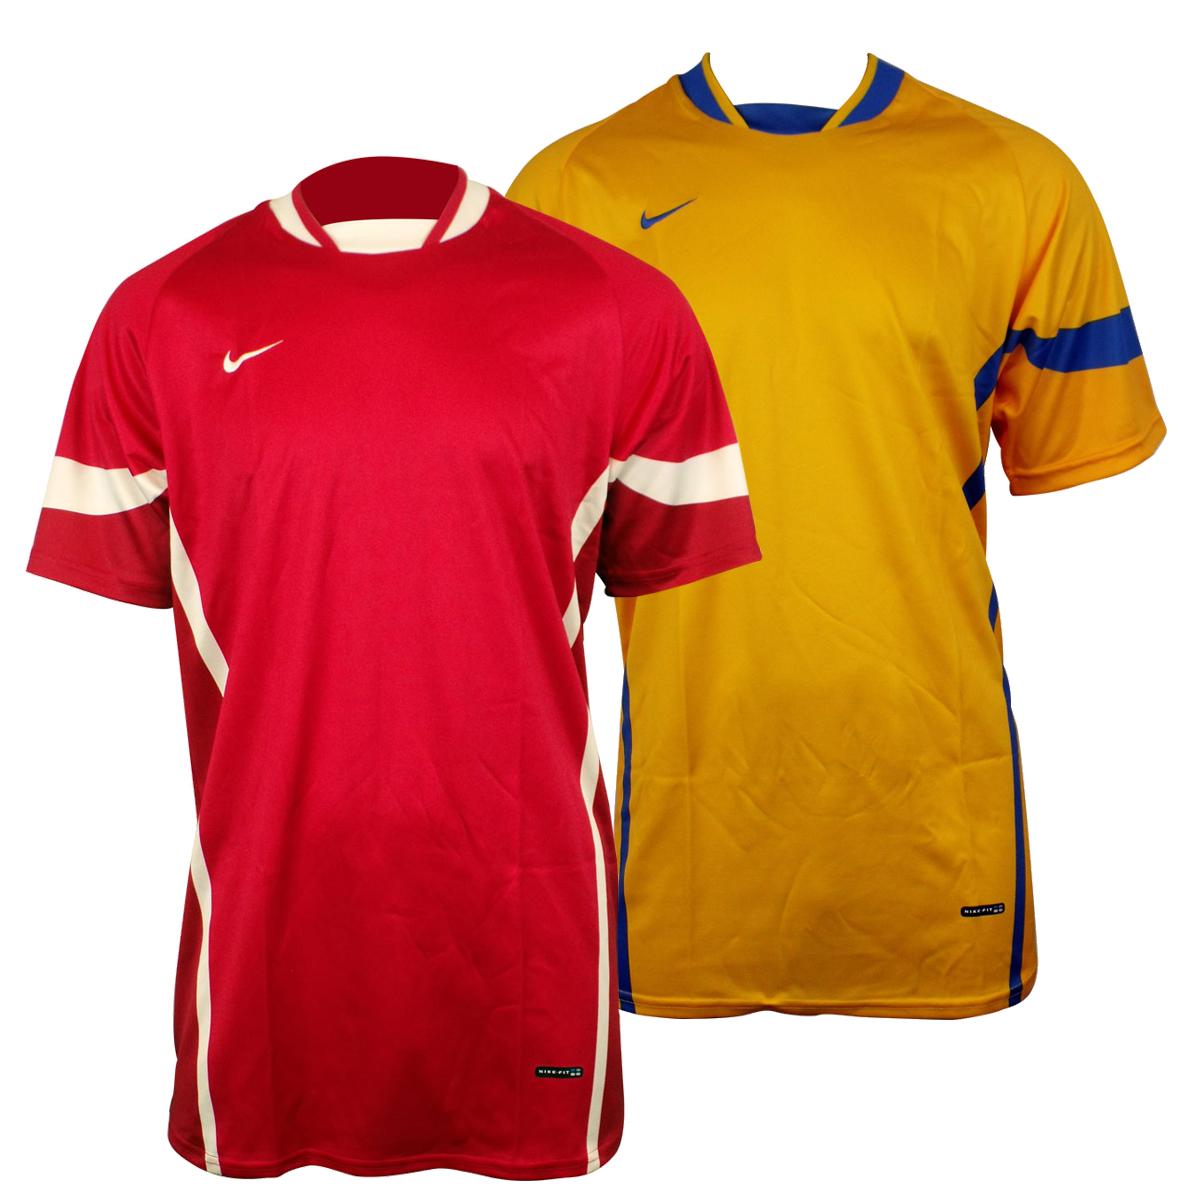 046c87e06c6cd Mens Nike Sports Dry Dri FIT Running Shirt Top T-Shirt Gym Training Tee  XS-XXL   eBay